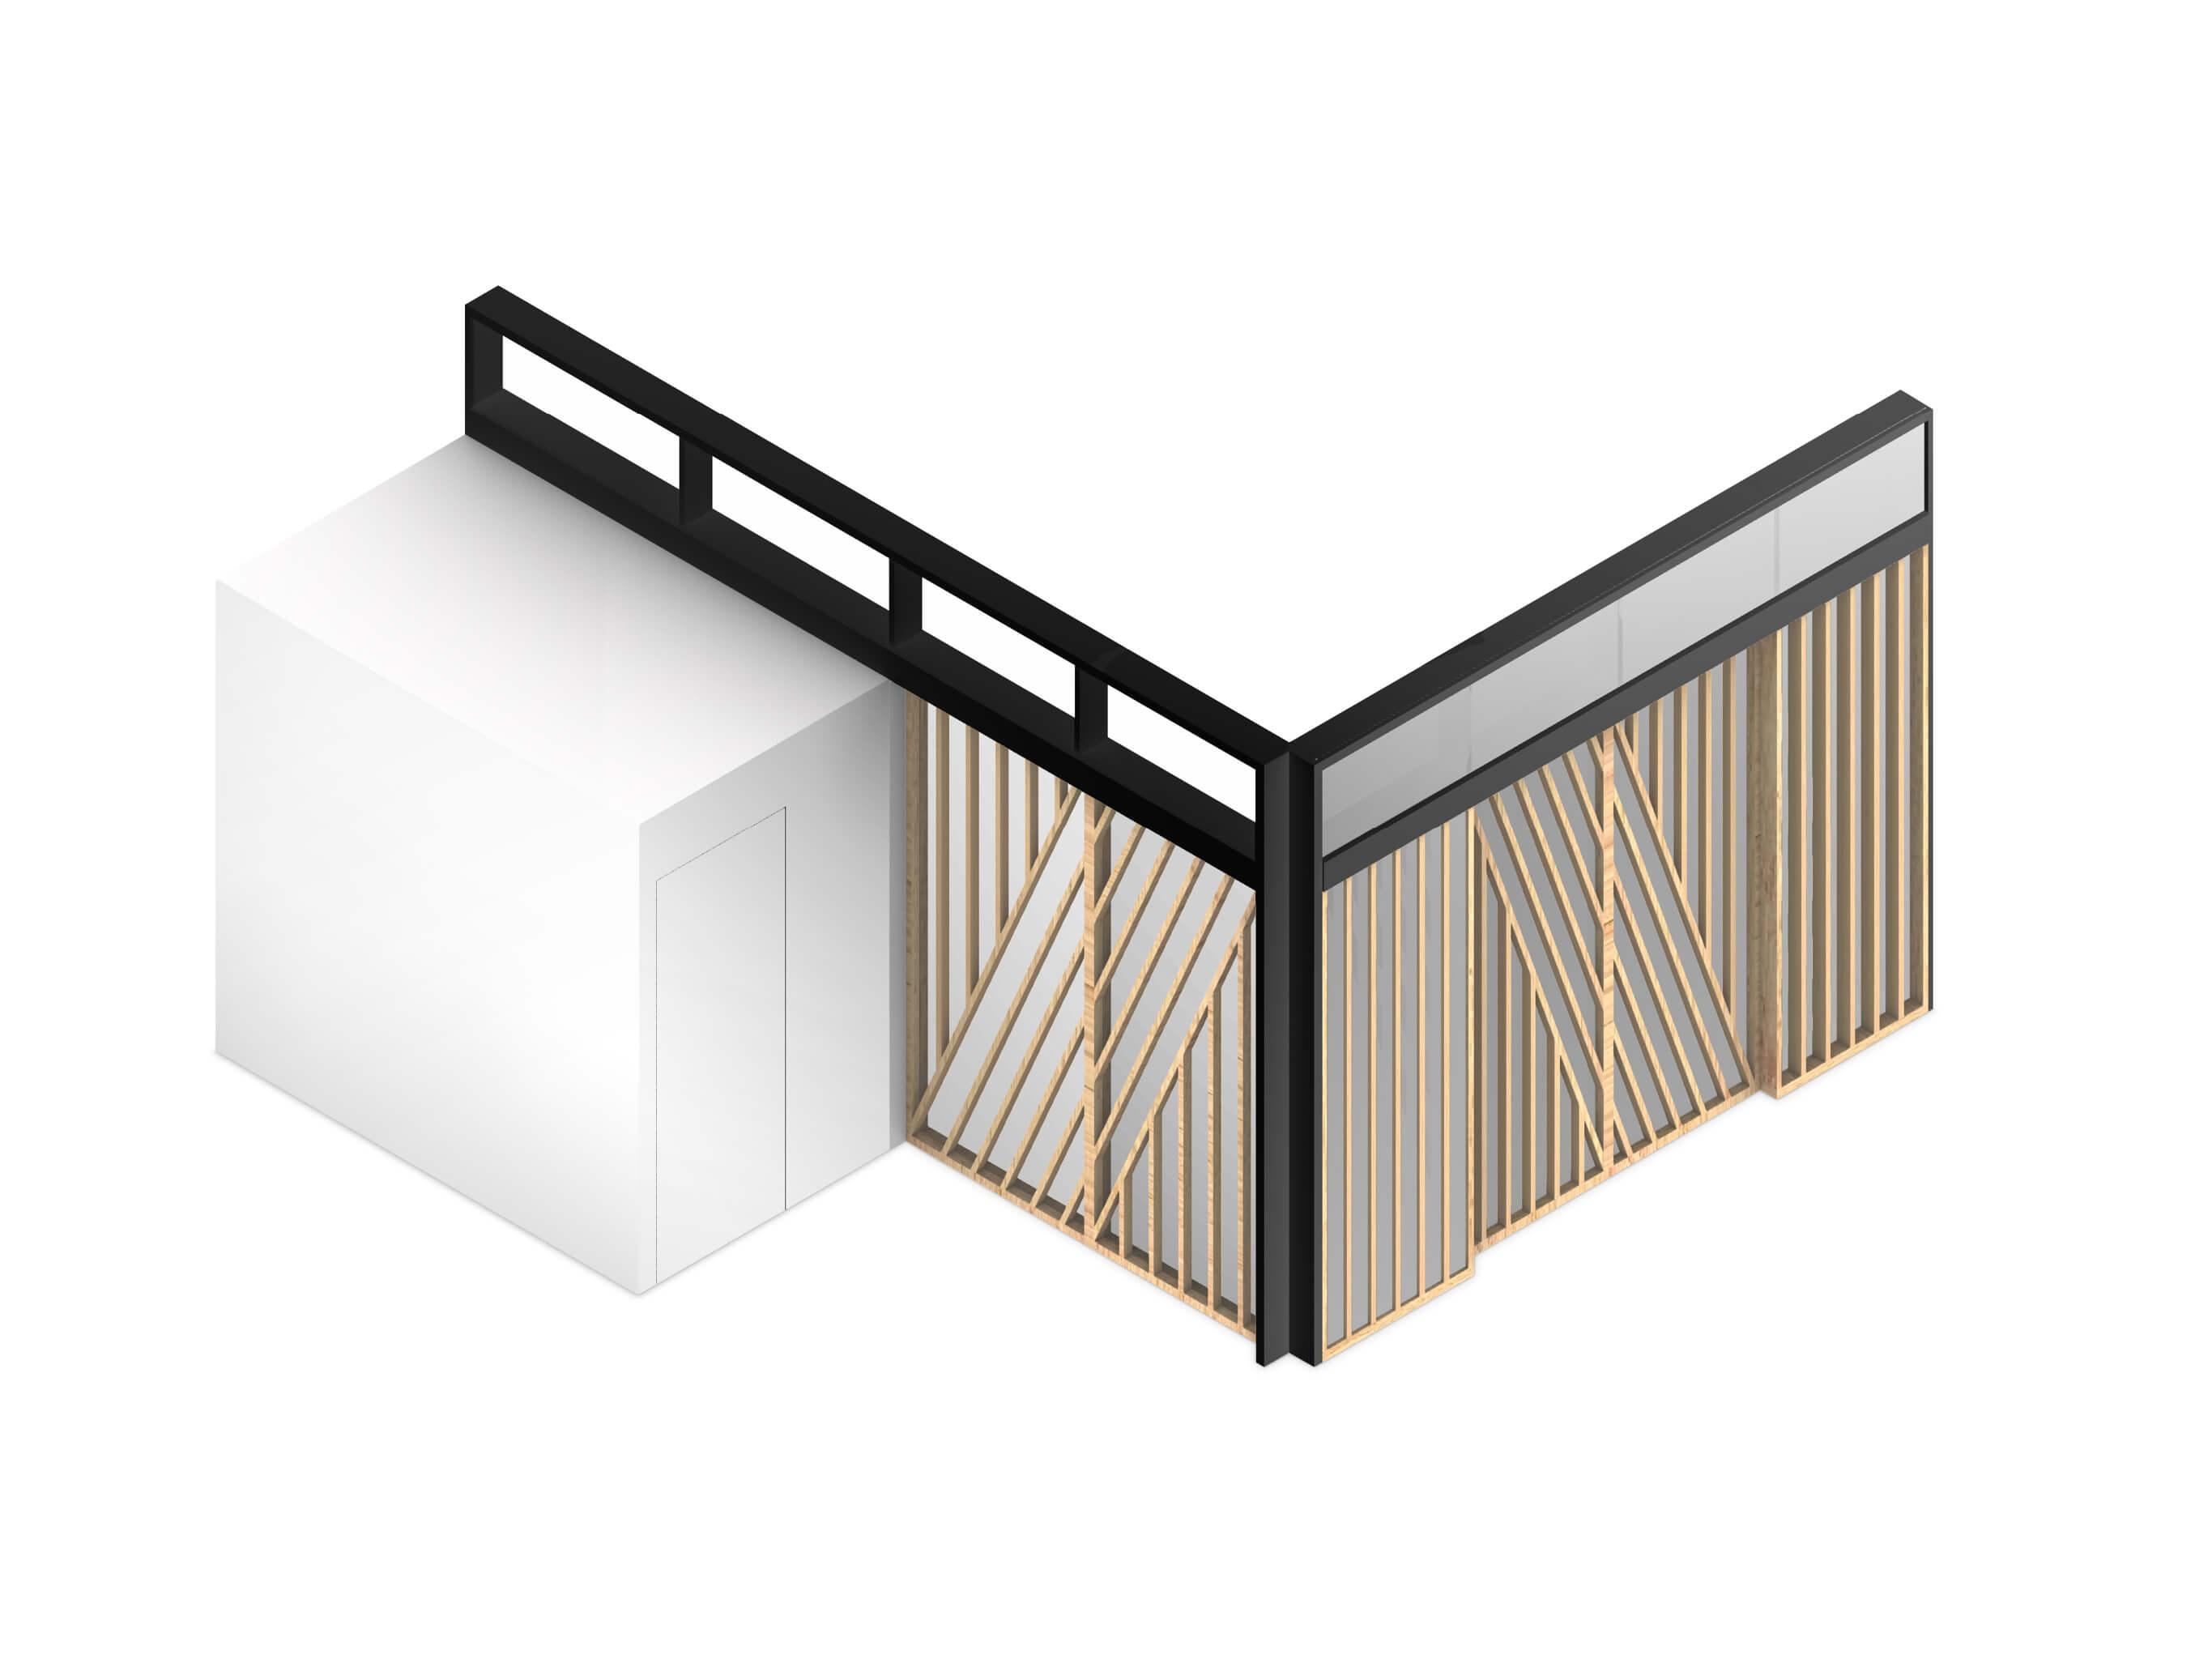 la-cremerie-mobilier-cloison-design-ichetkar3